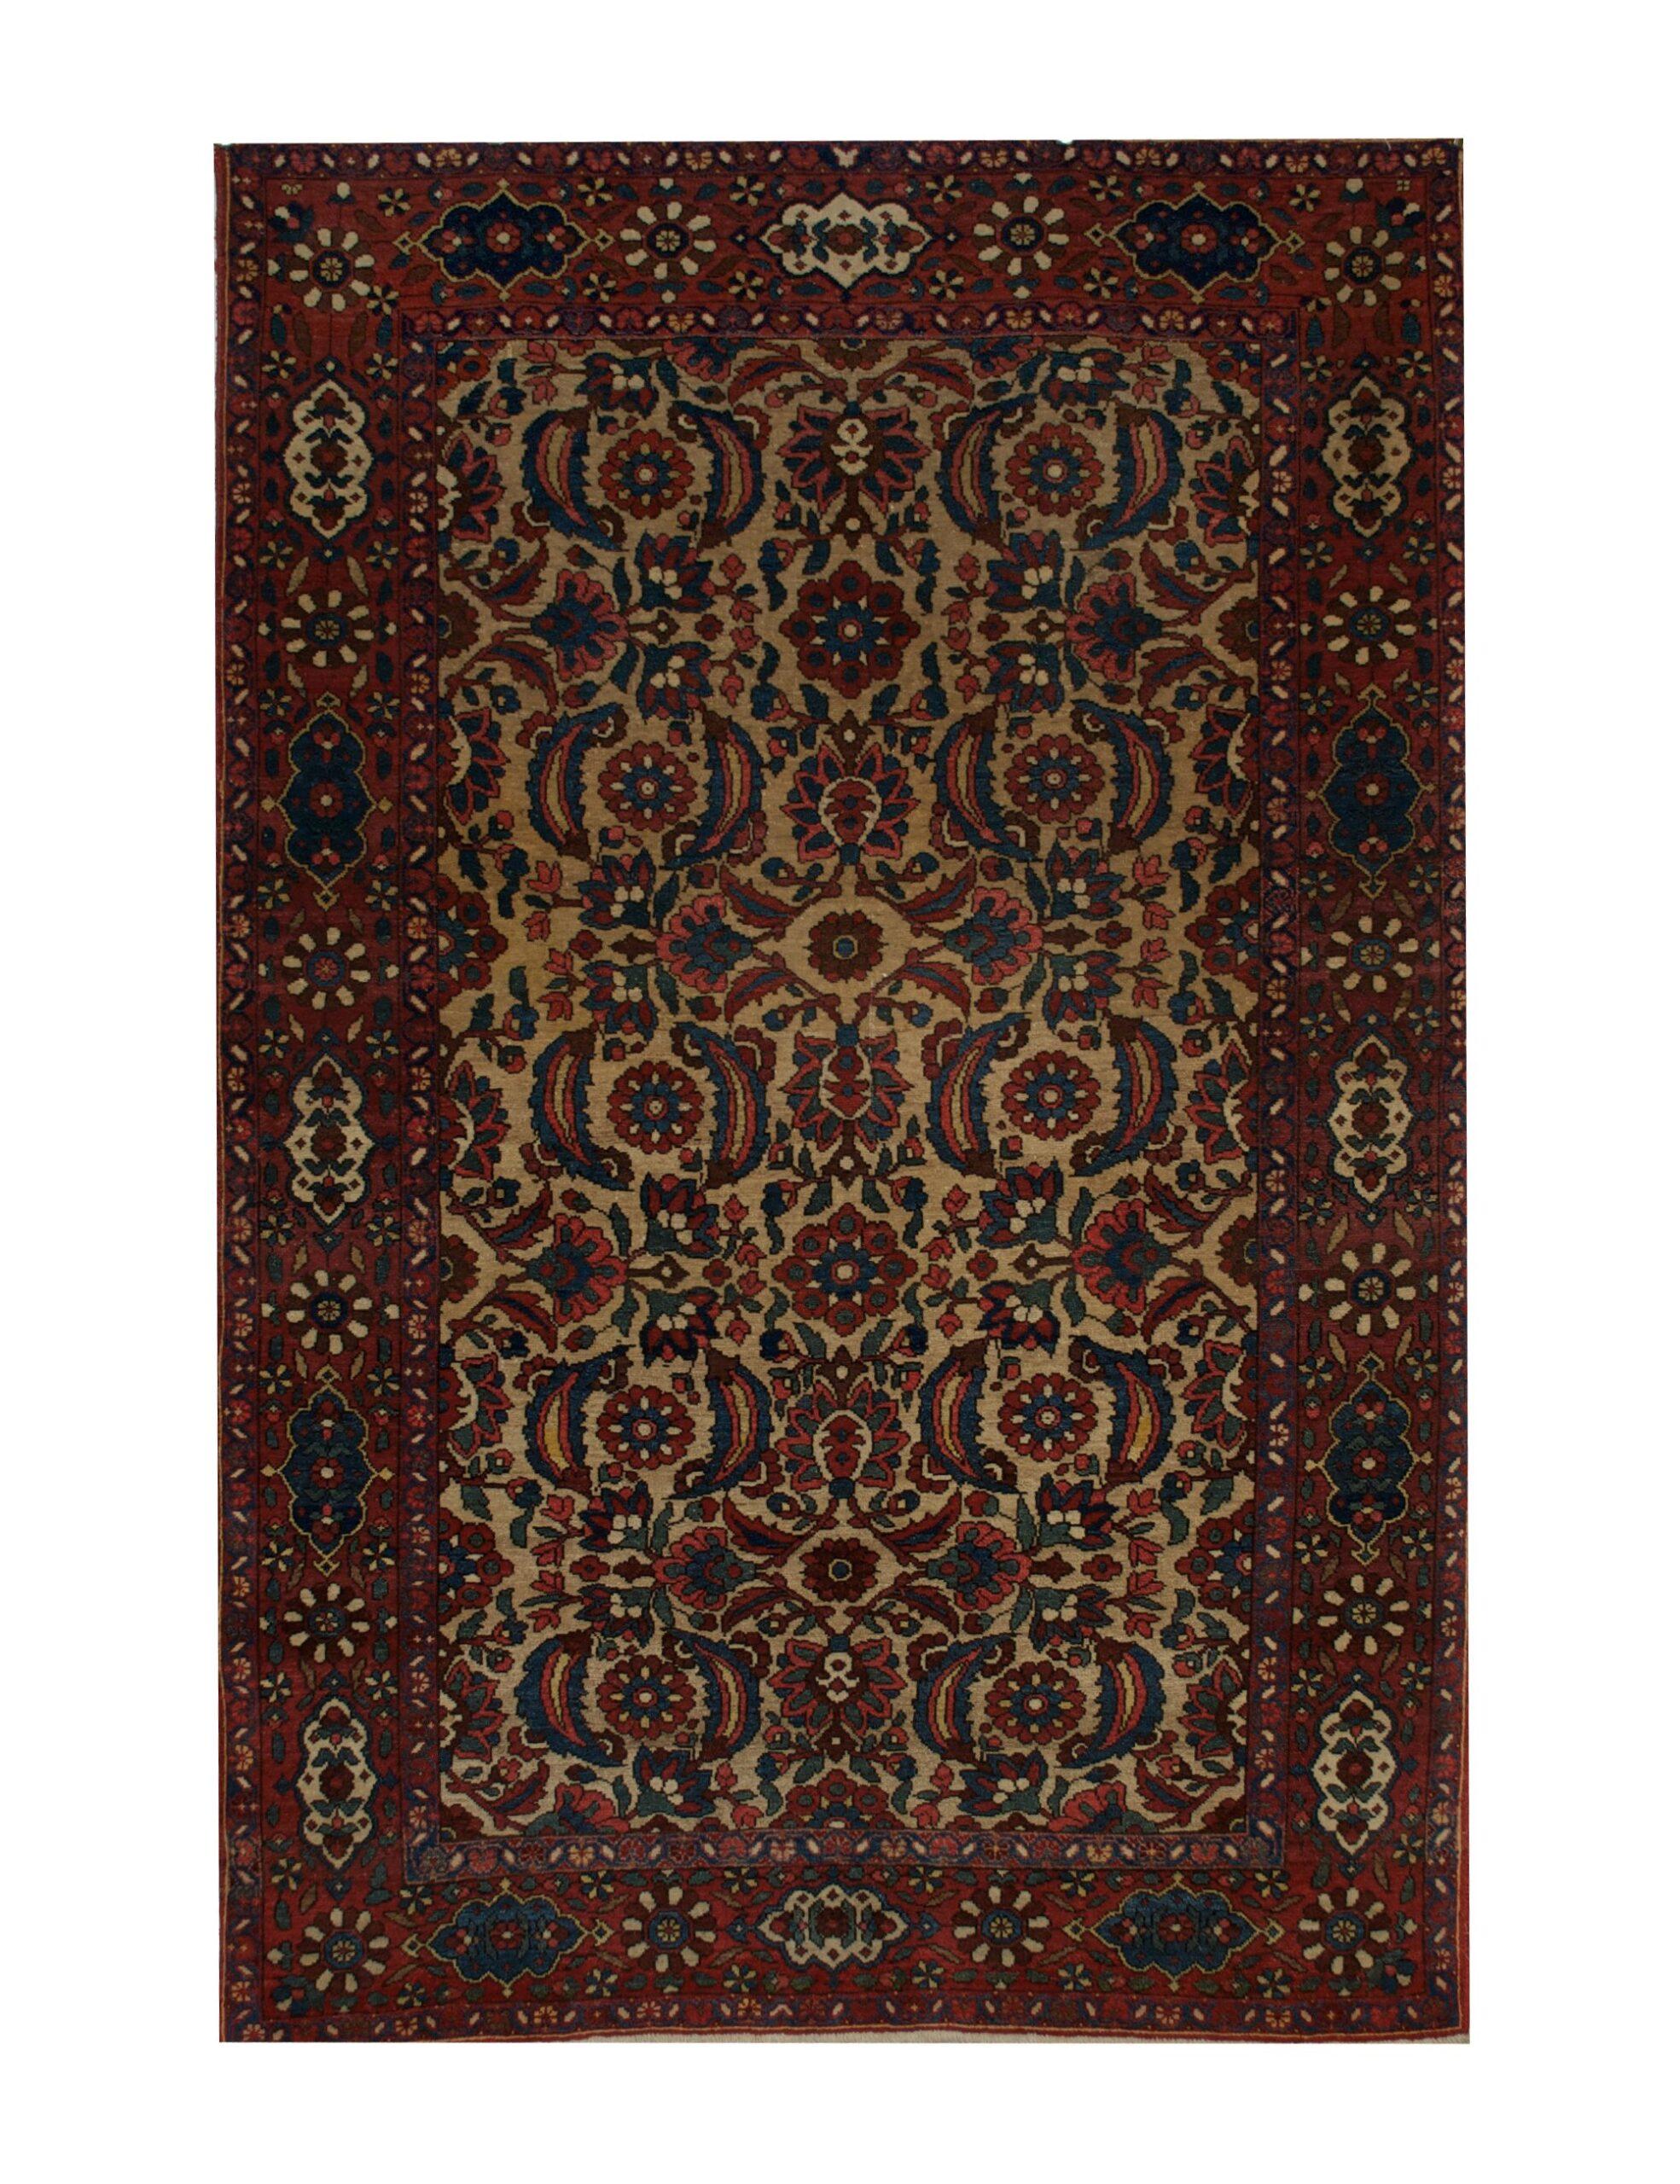 "Antique Persian Bakhtiari 4' 3"" x 6' 11"" - Shabahang Royal Carpet"